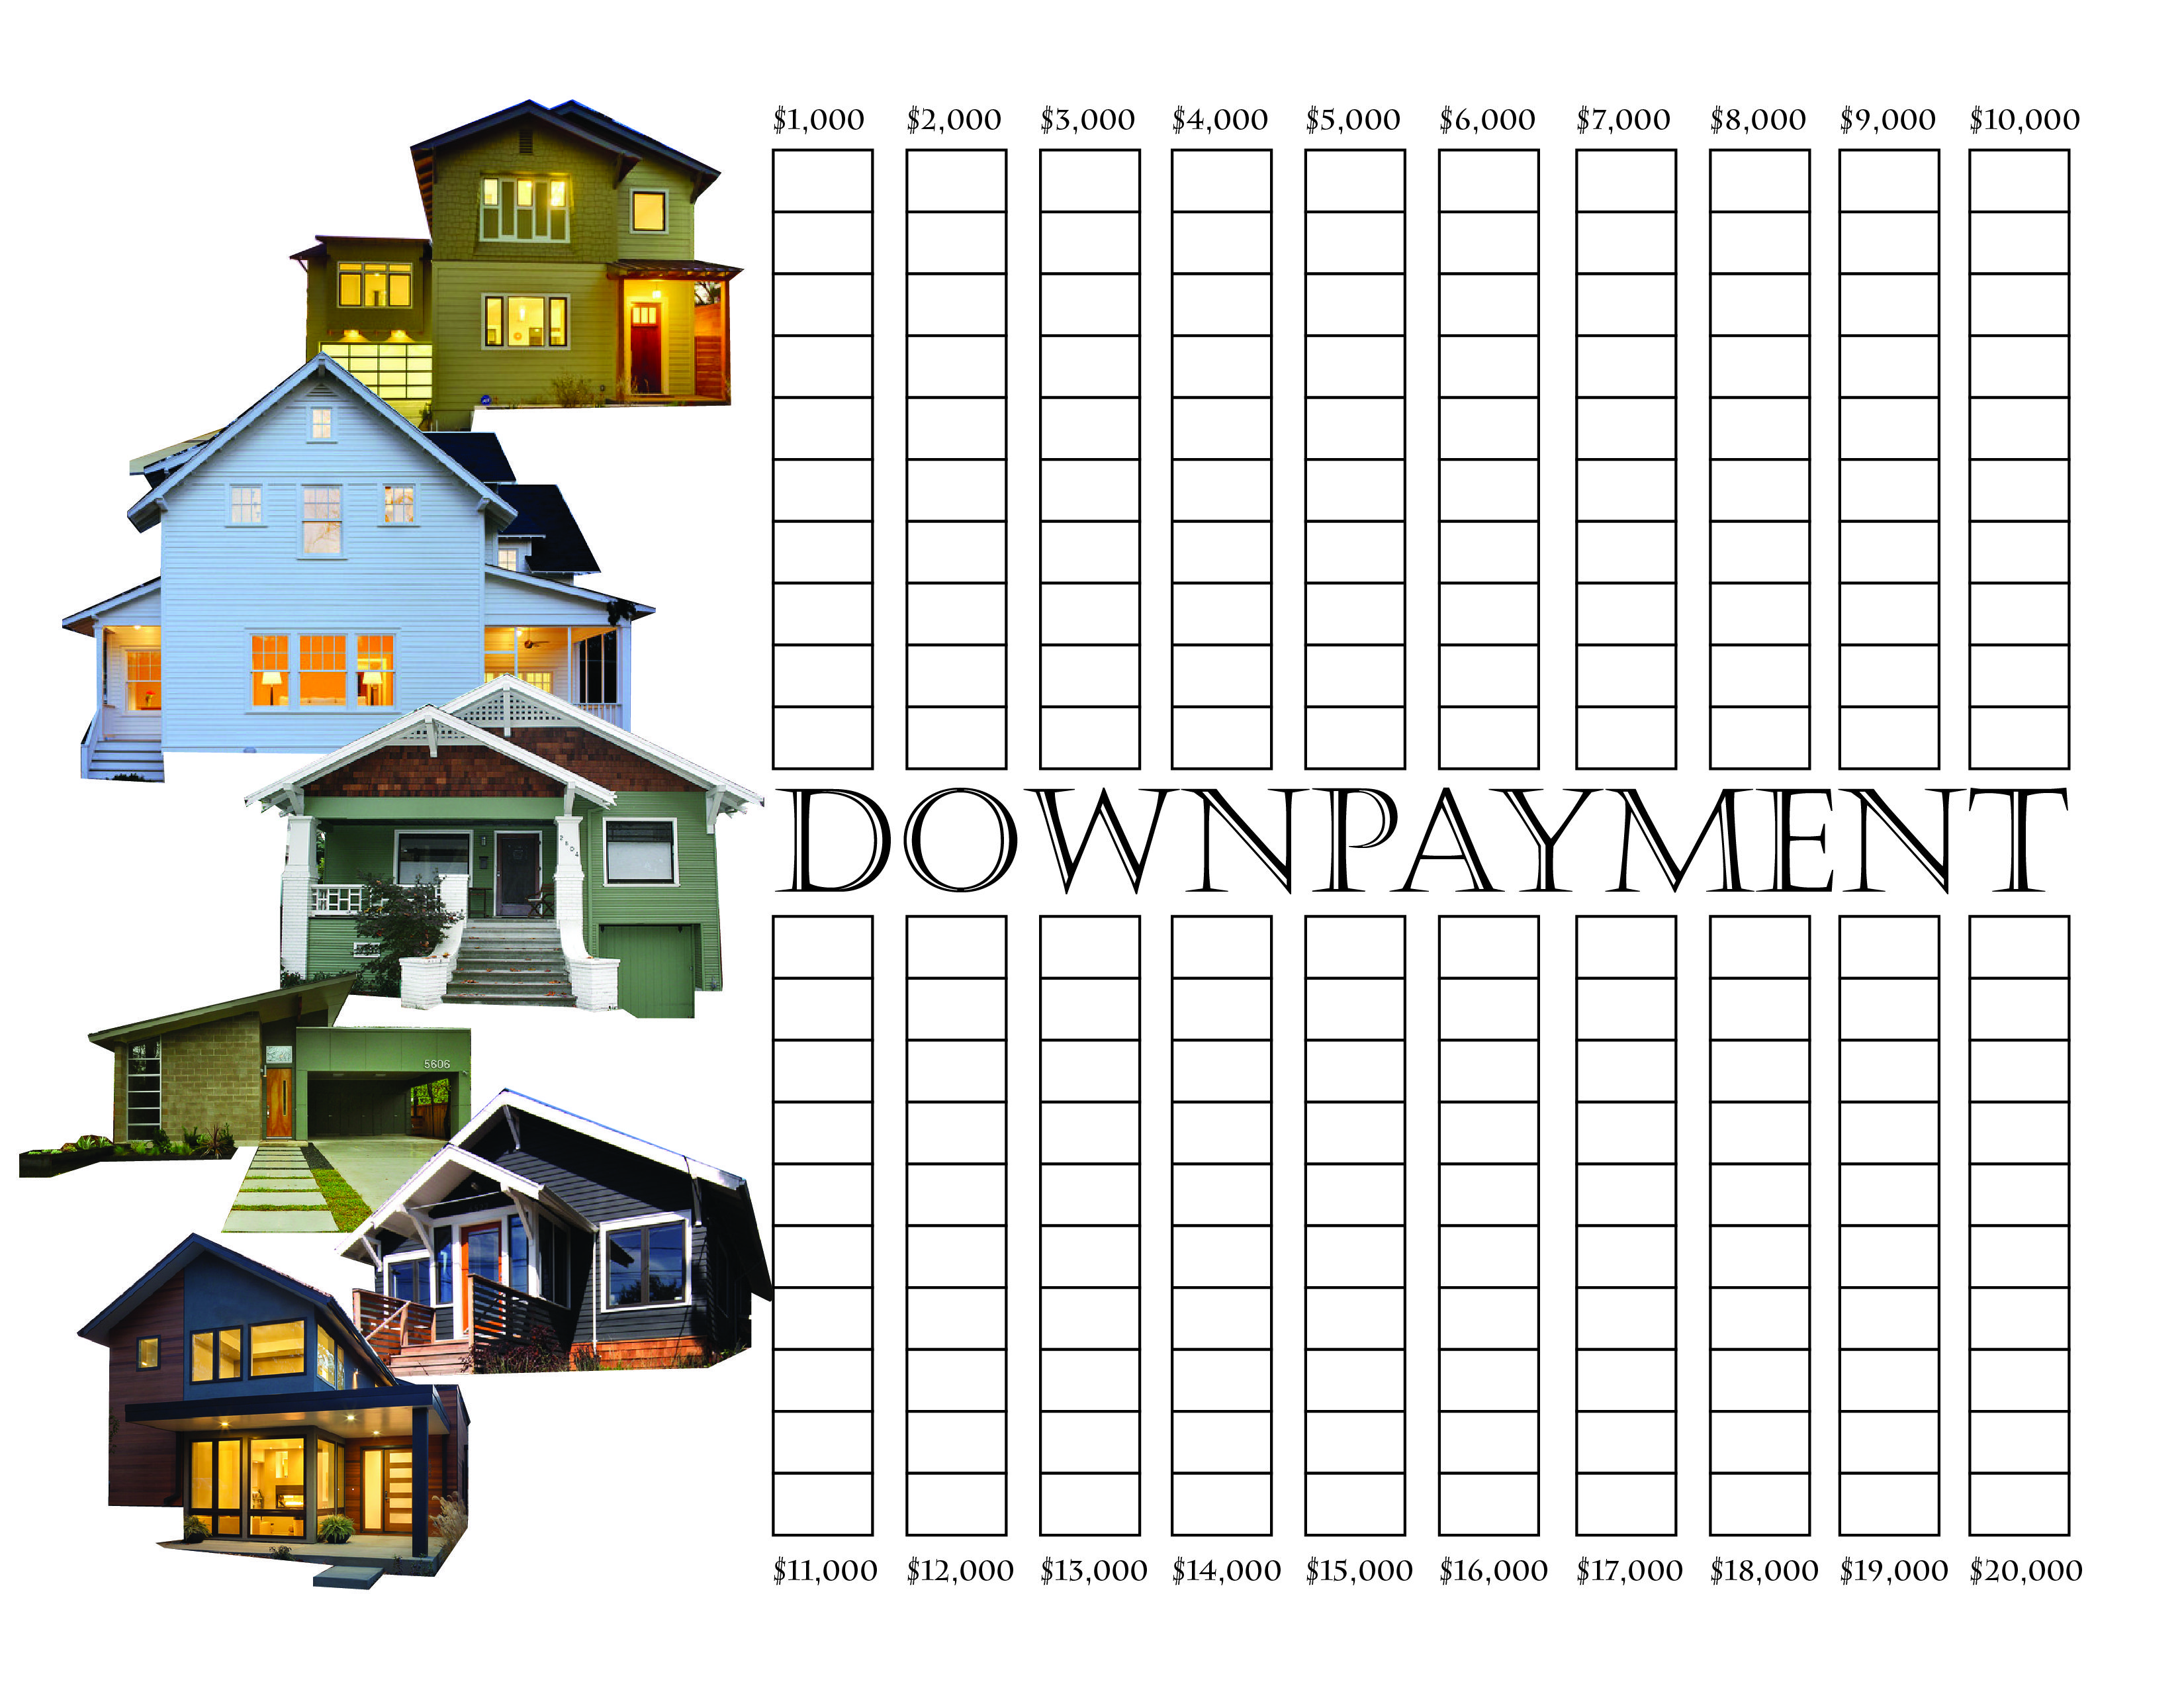 Downpayment Saving Chart 20k